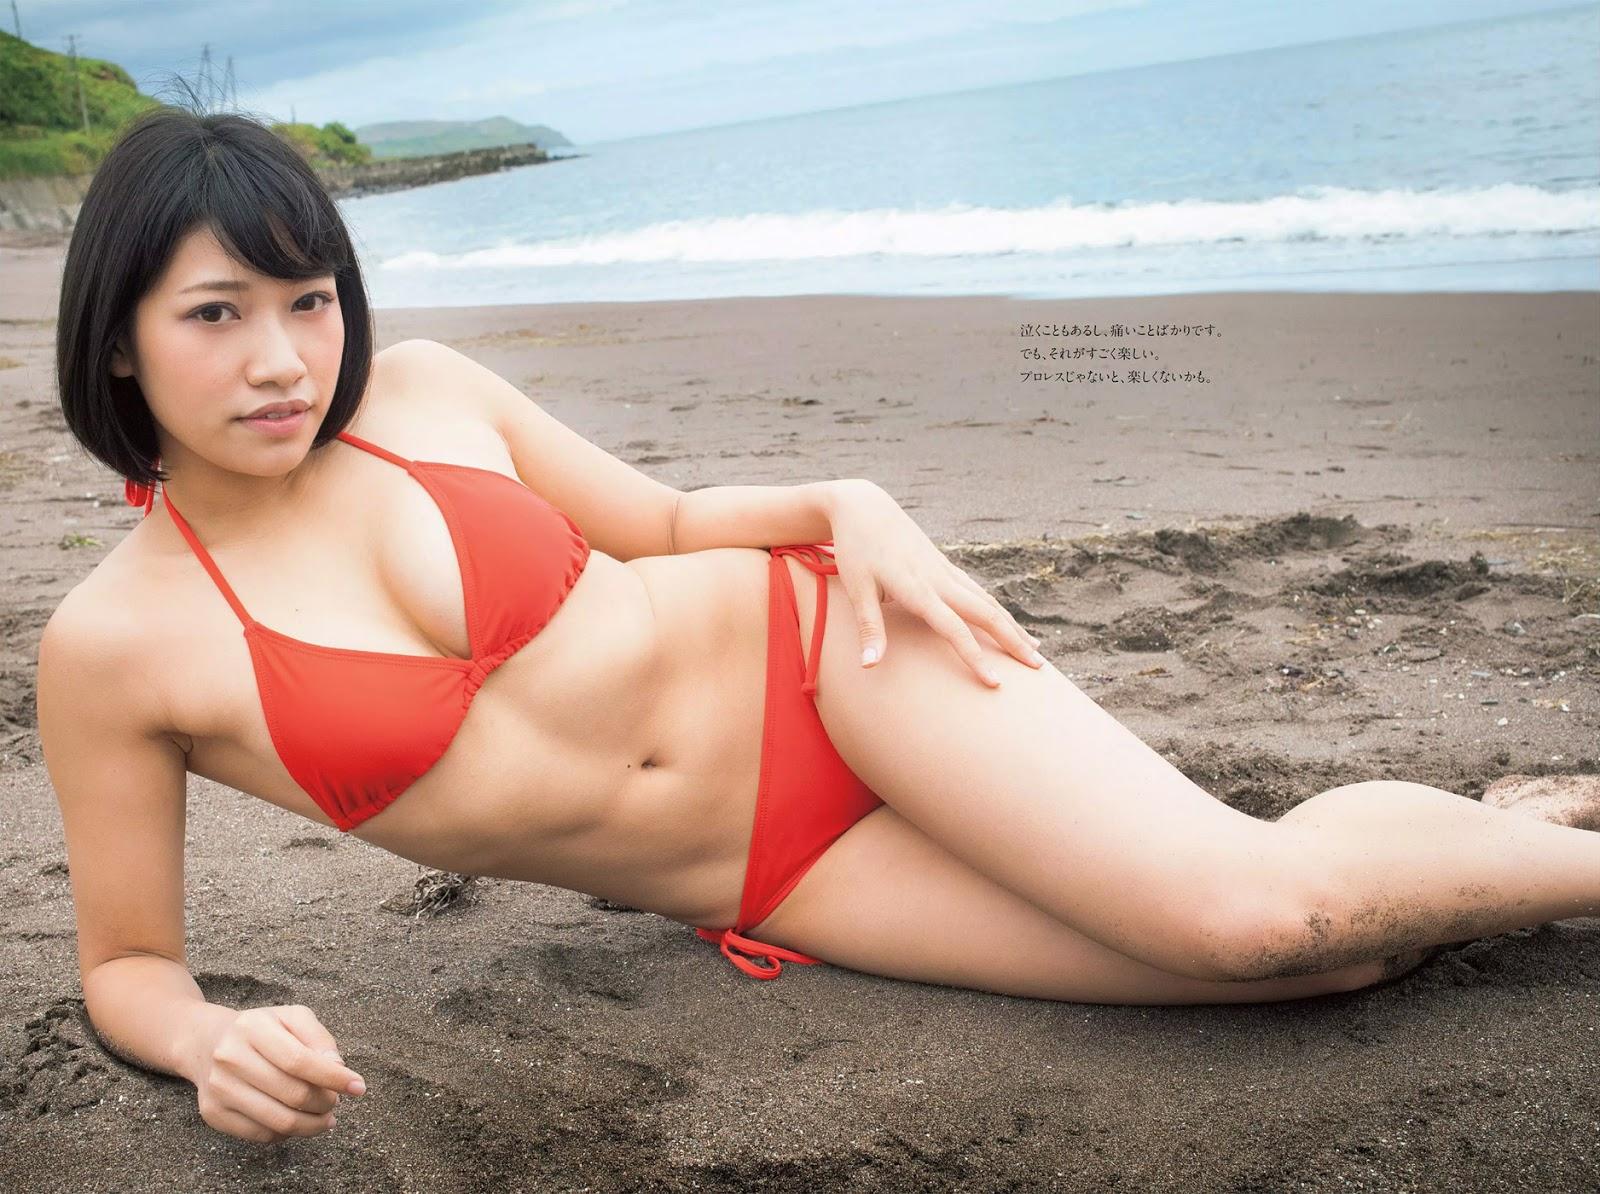 Hana Kimura 木村花, Weekly Playboy 2017 No.44 (週刊プレイボーイ 2017年44号)